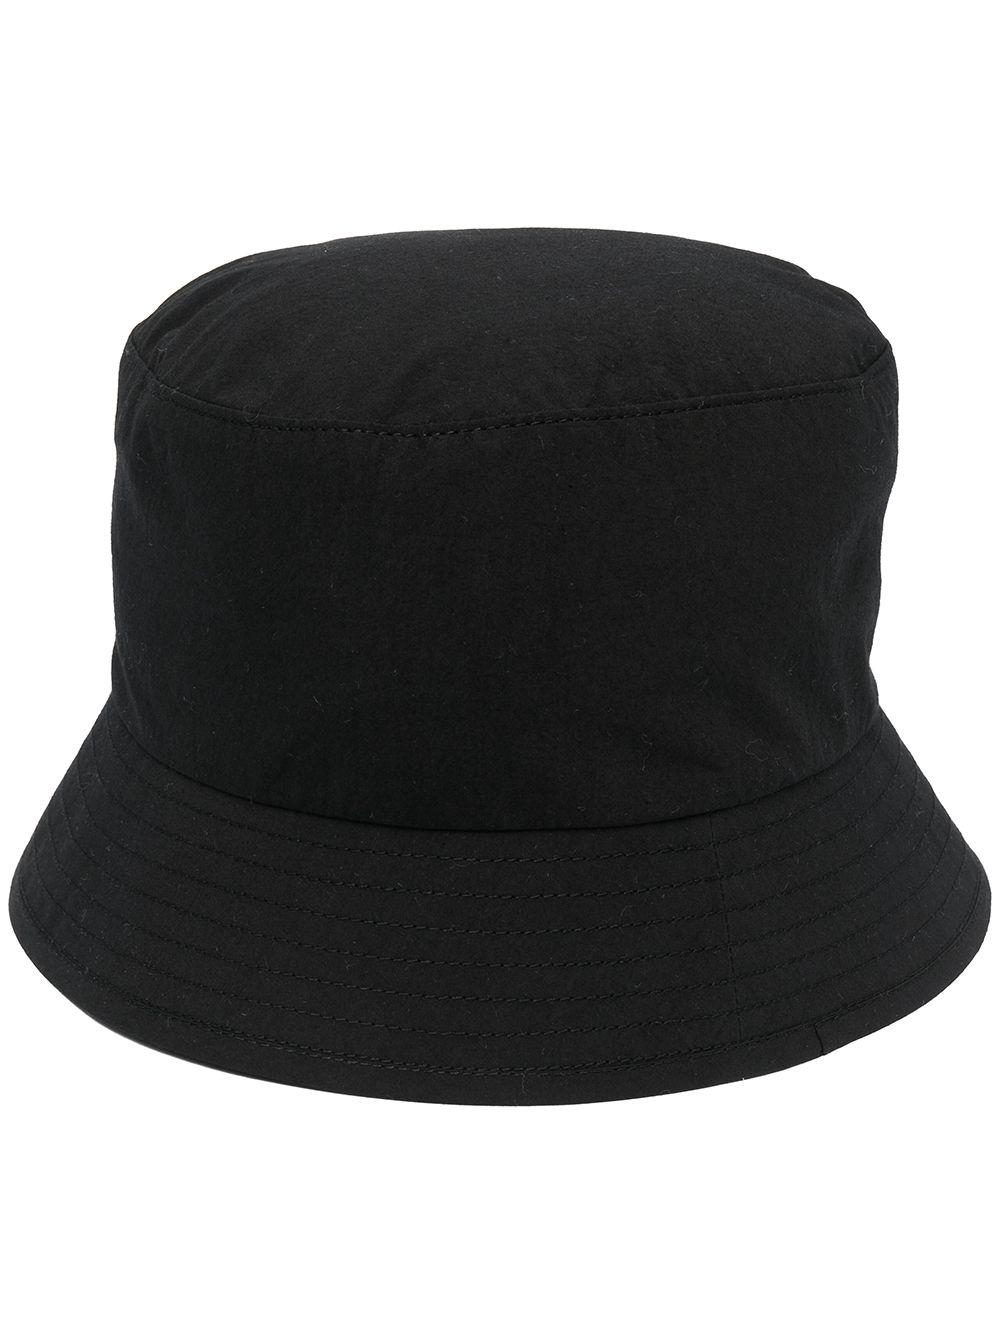 Craig Green laced bucket hat man black CRAIG GREEN | Hats | CGSS21CWOHAT01BLACK